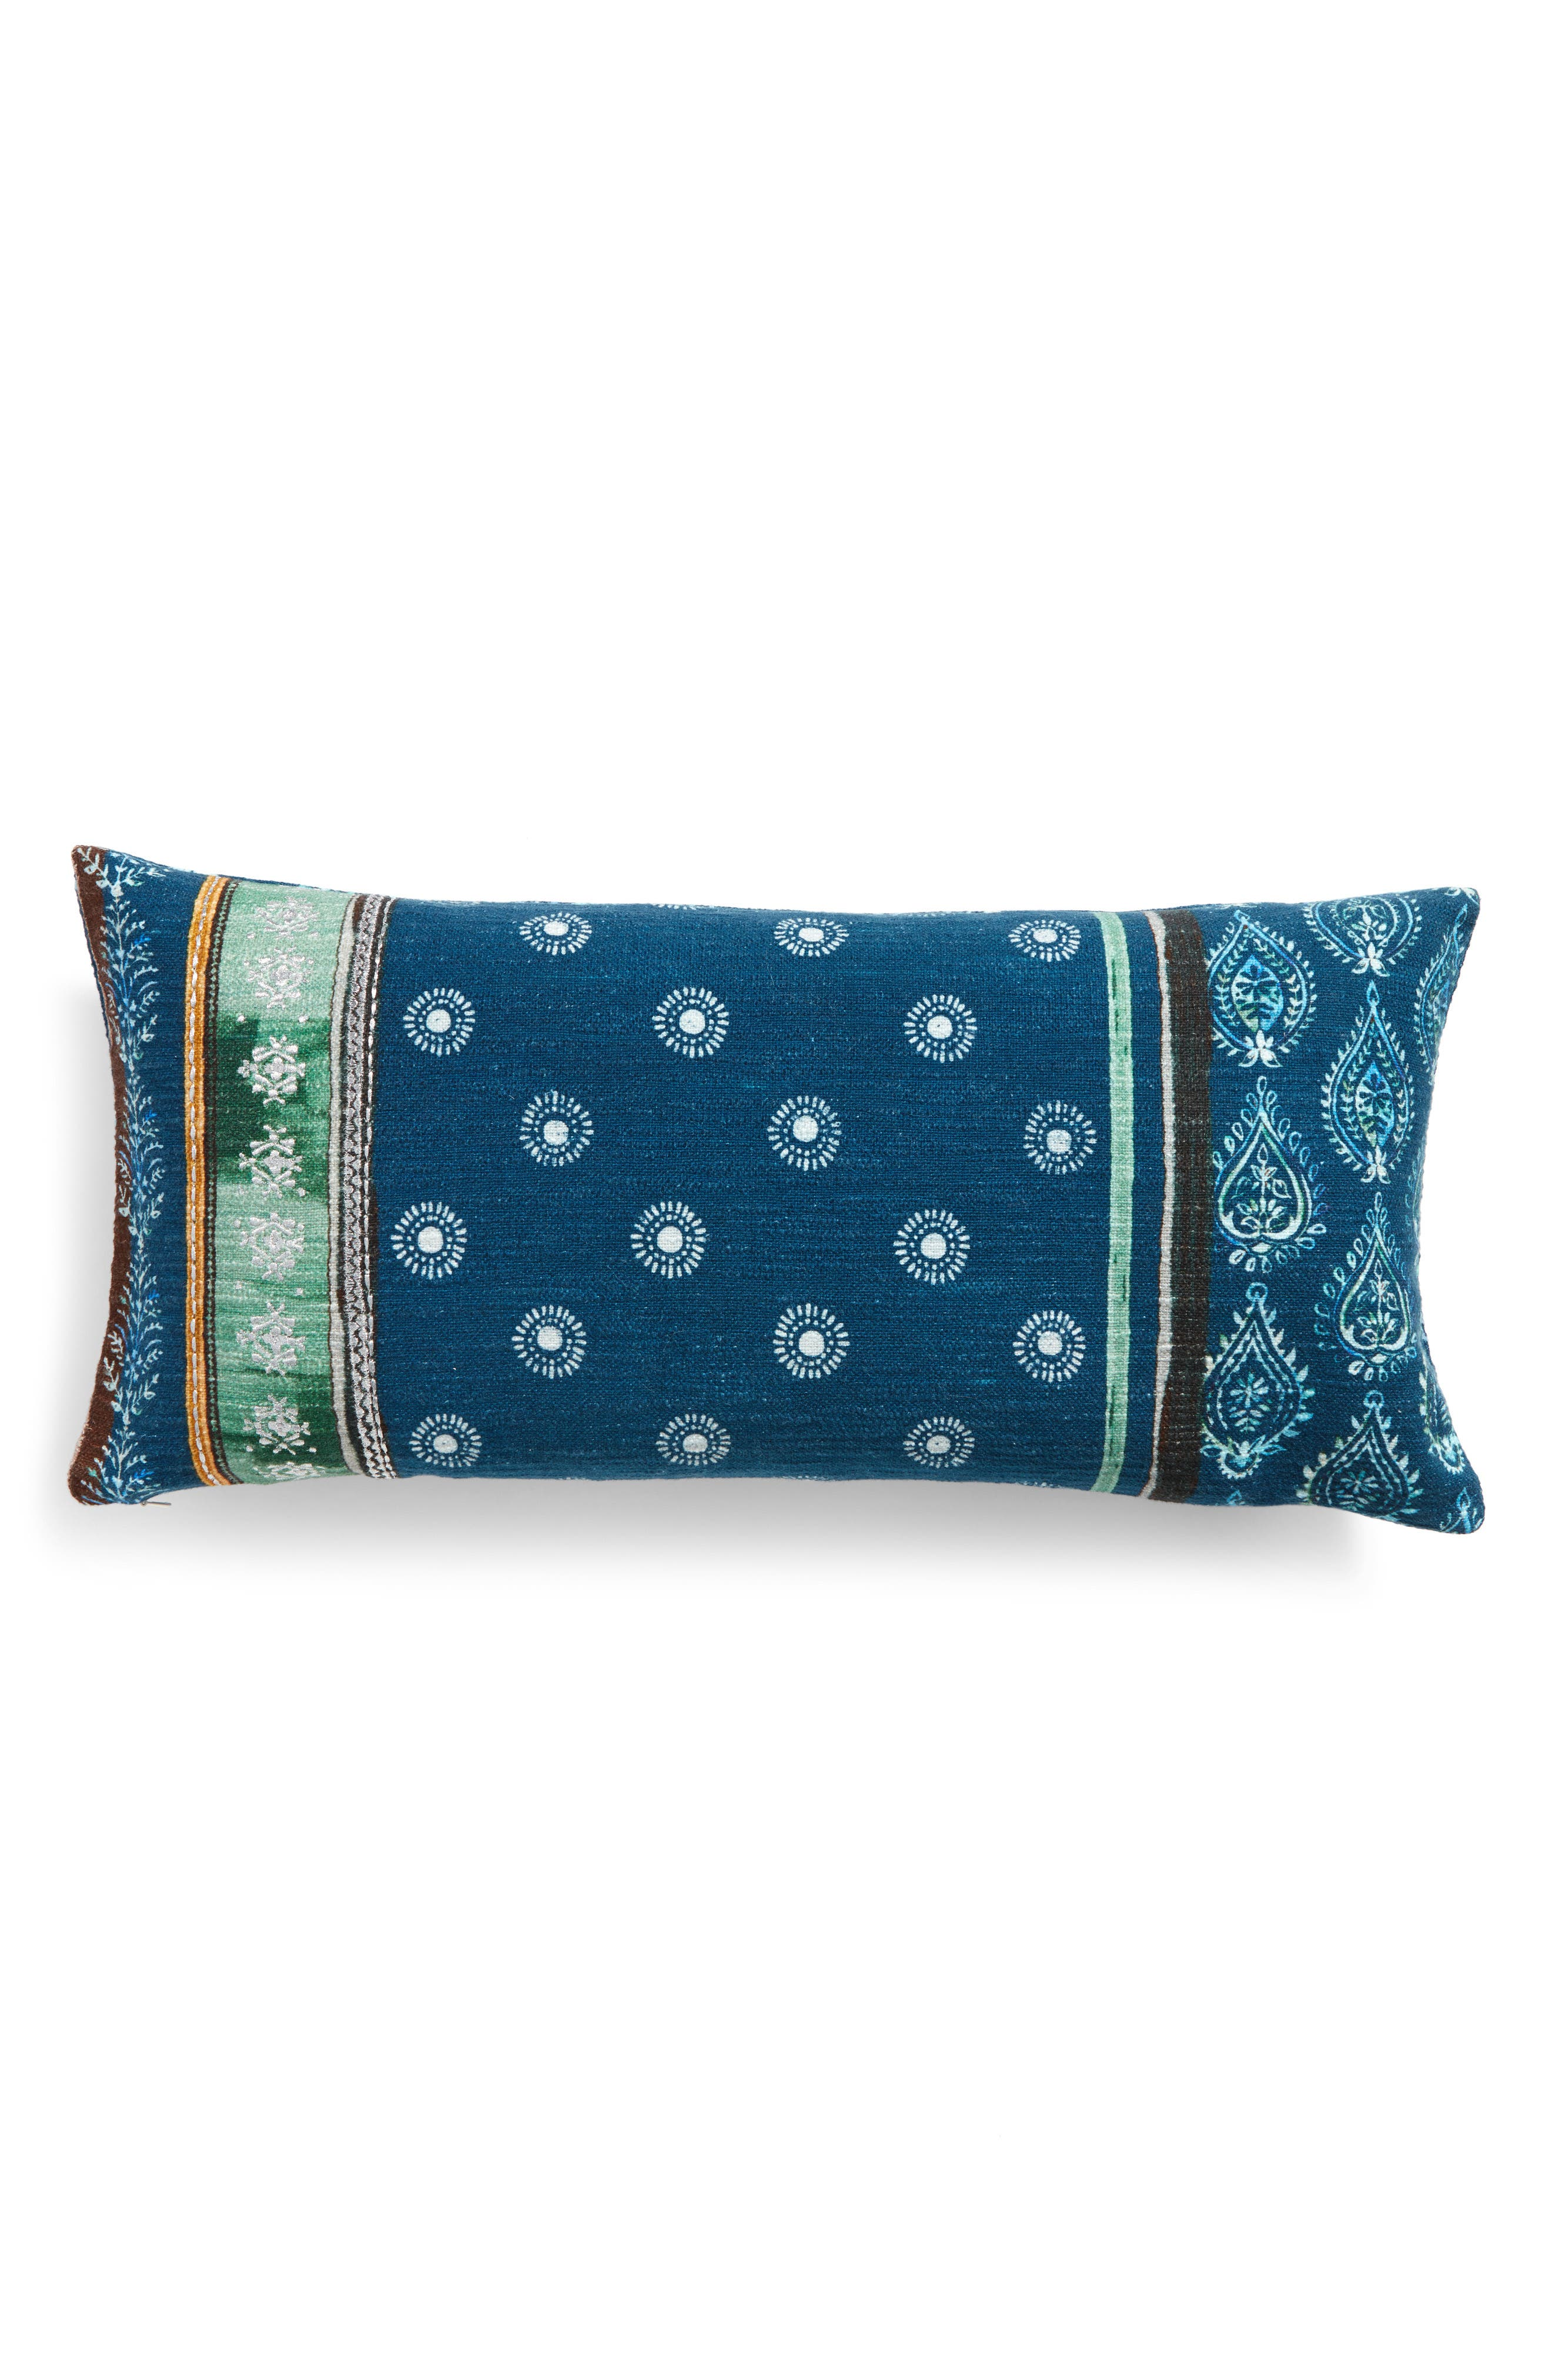 Alternate Image 1 Selected - Nordstrom at Home Block Print Pillow